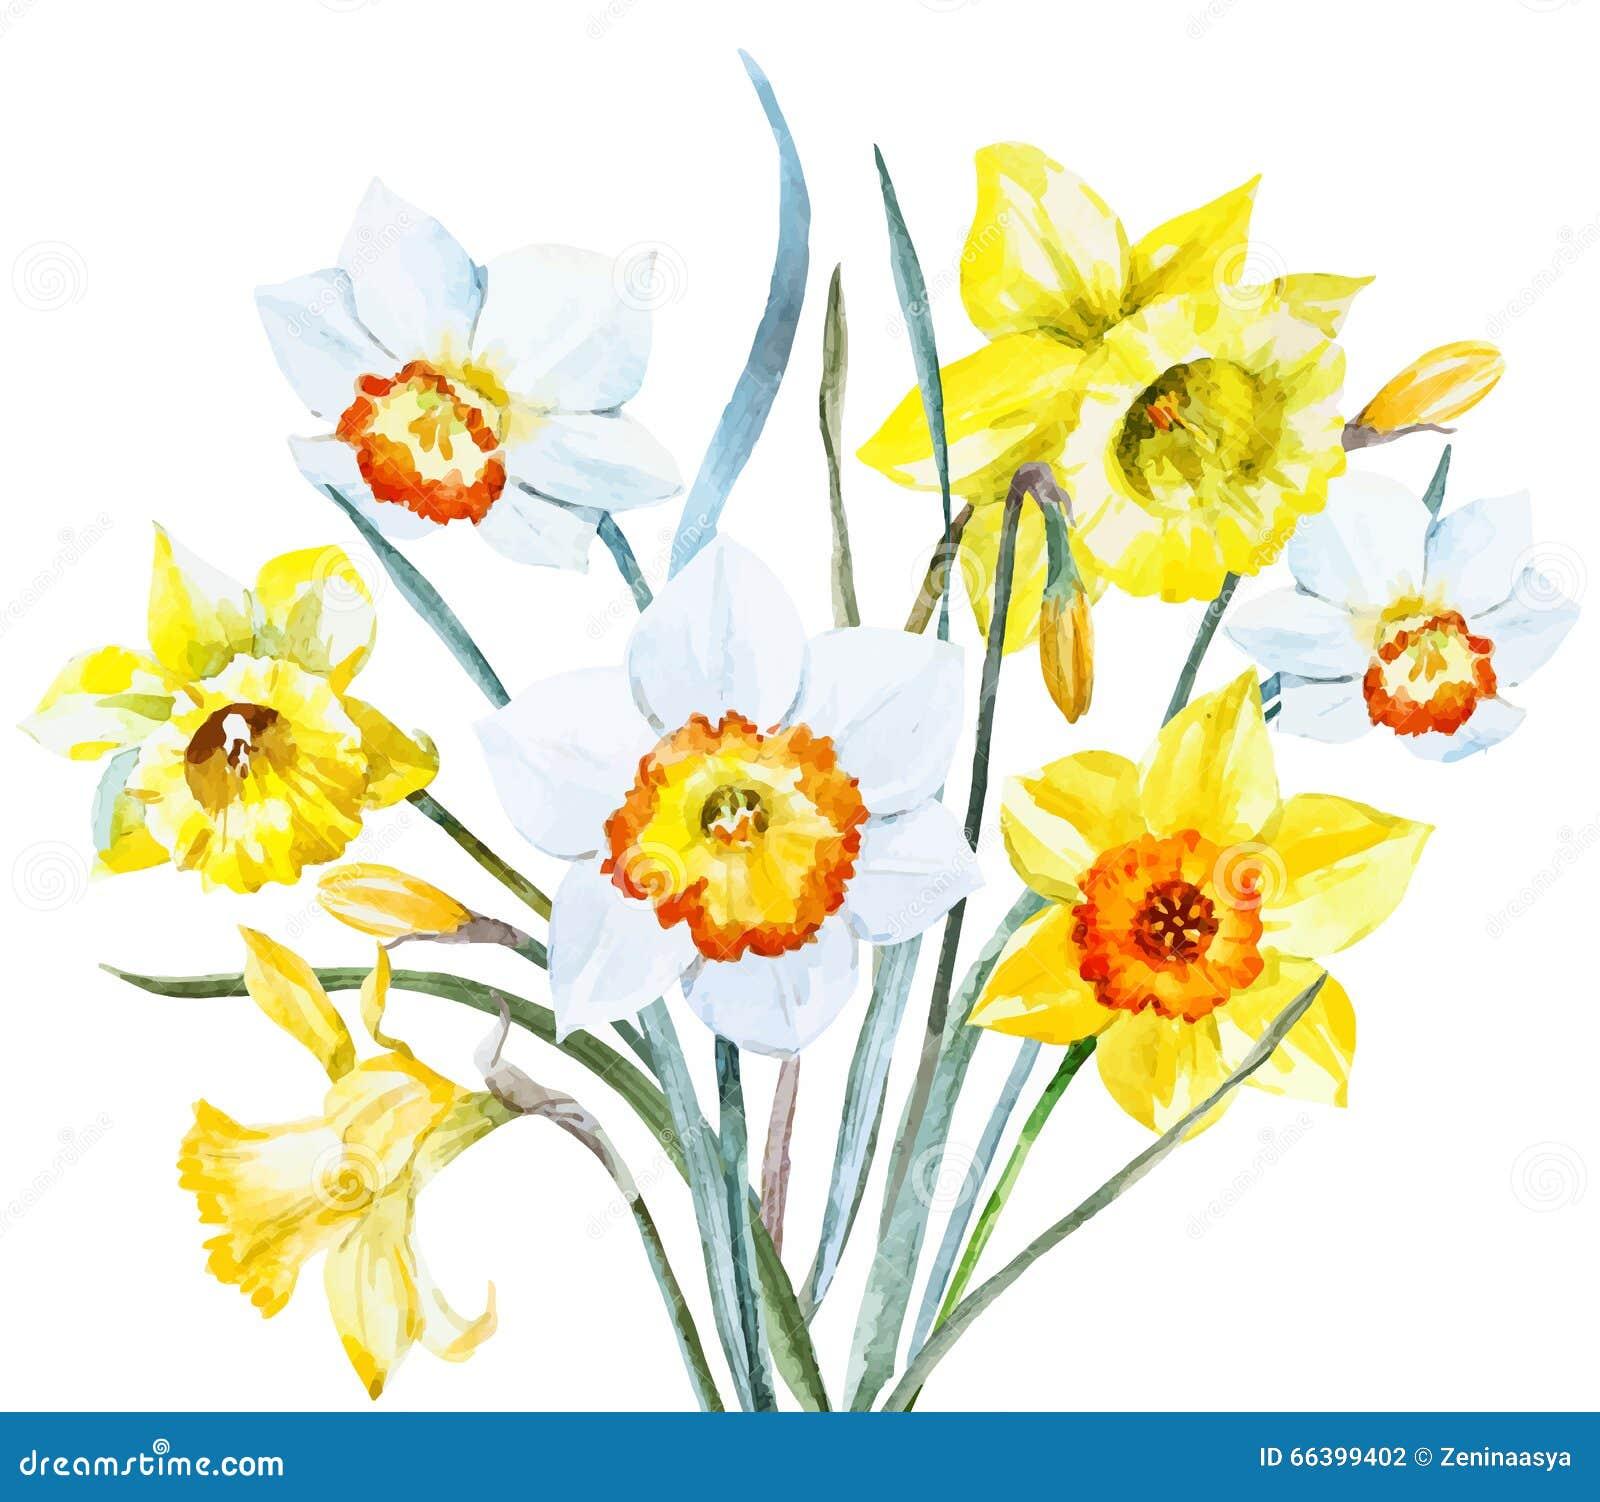 Watercolor spring flowers stock vector illustration of for Spring flowers watercolor